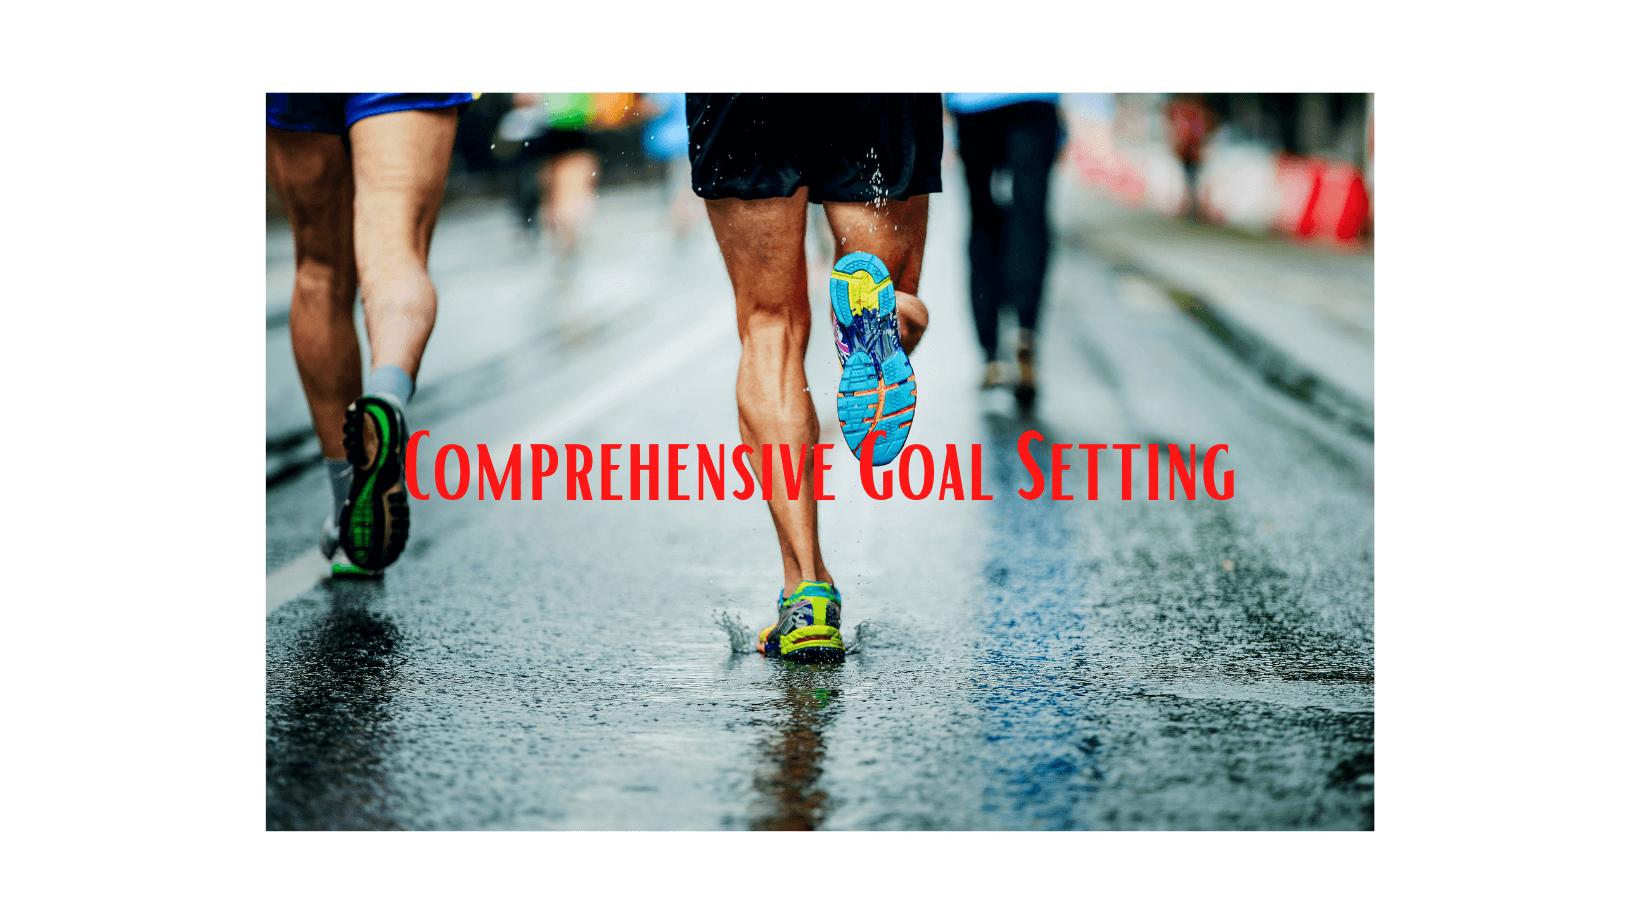 Comprehensive Goal Setting